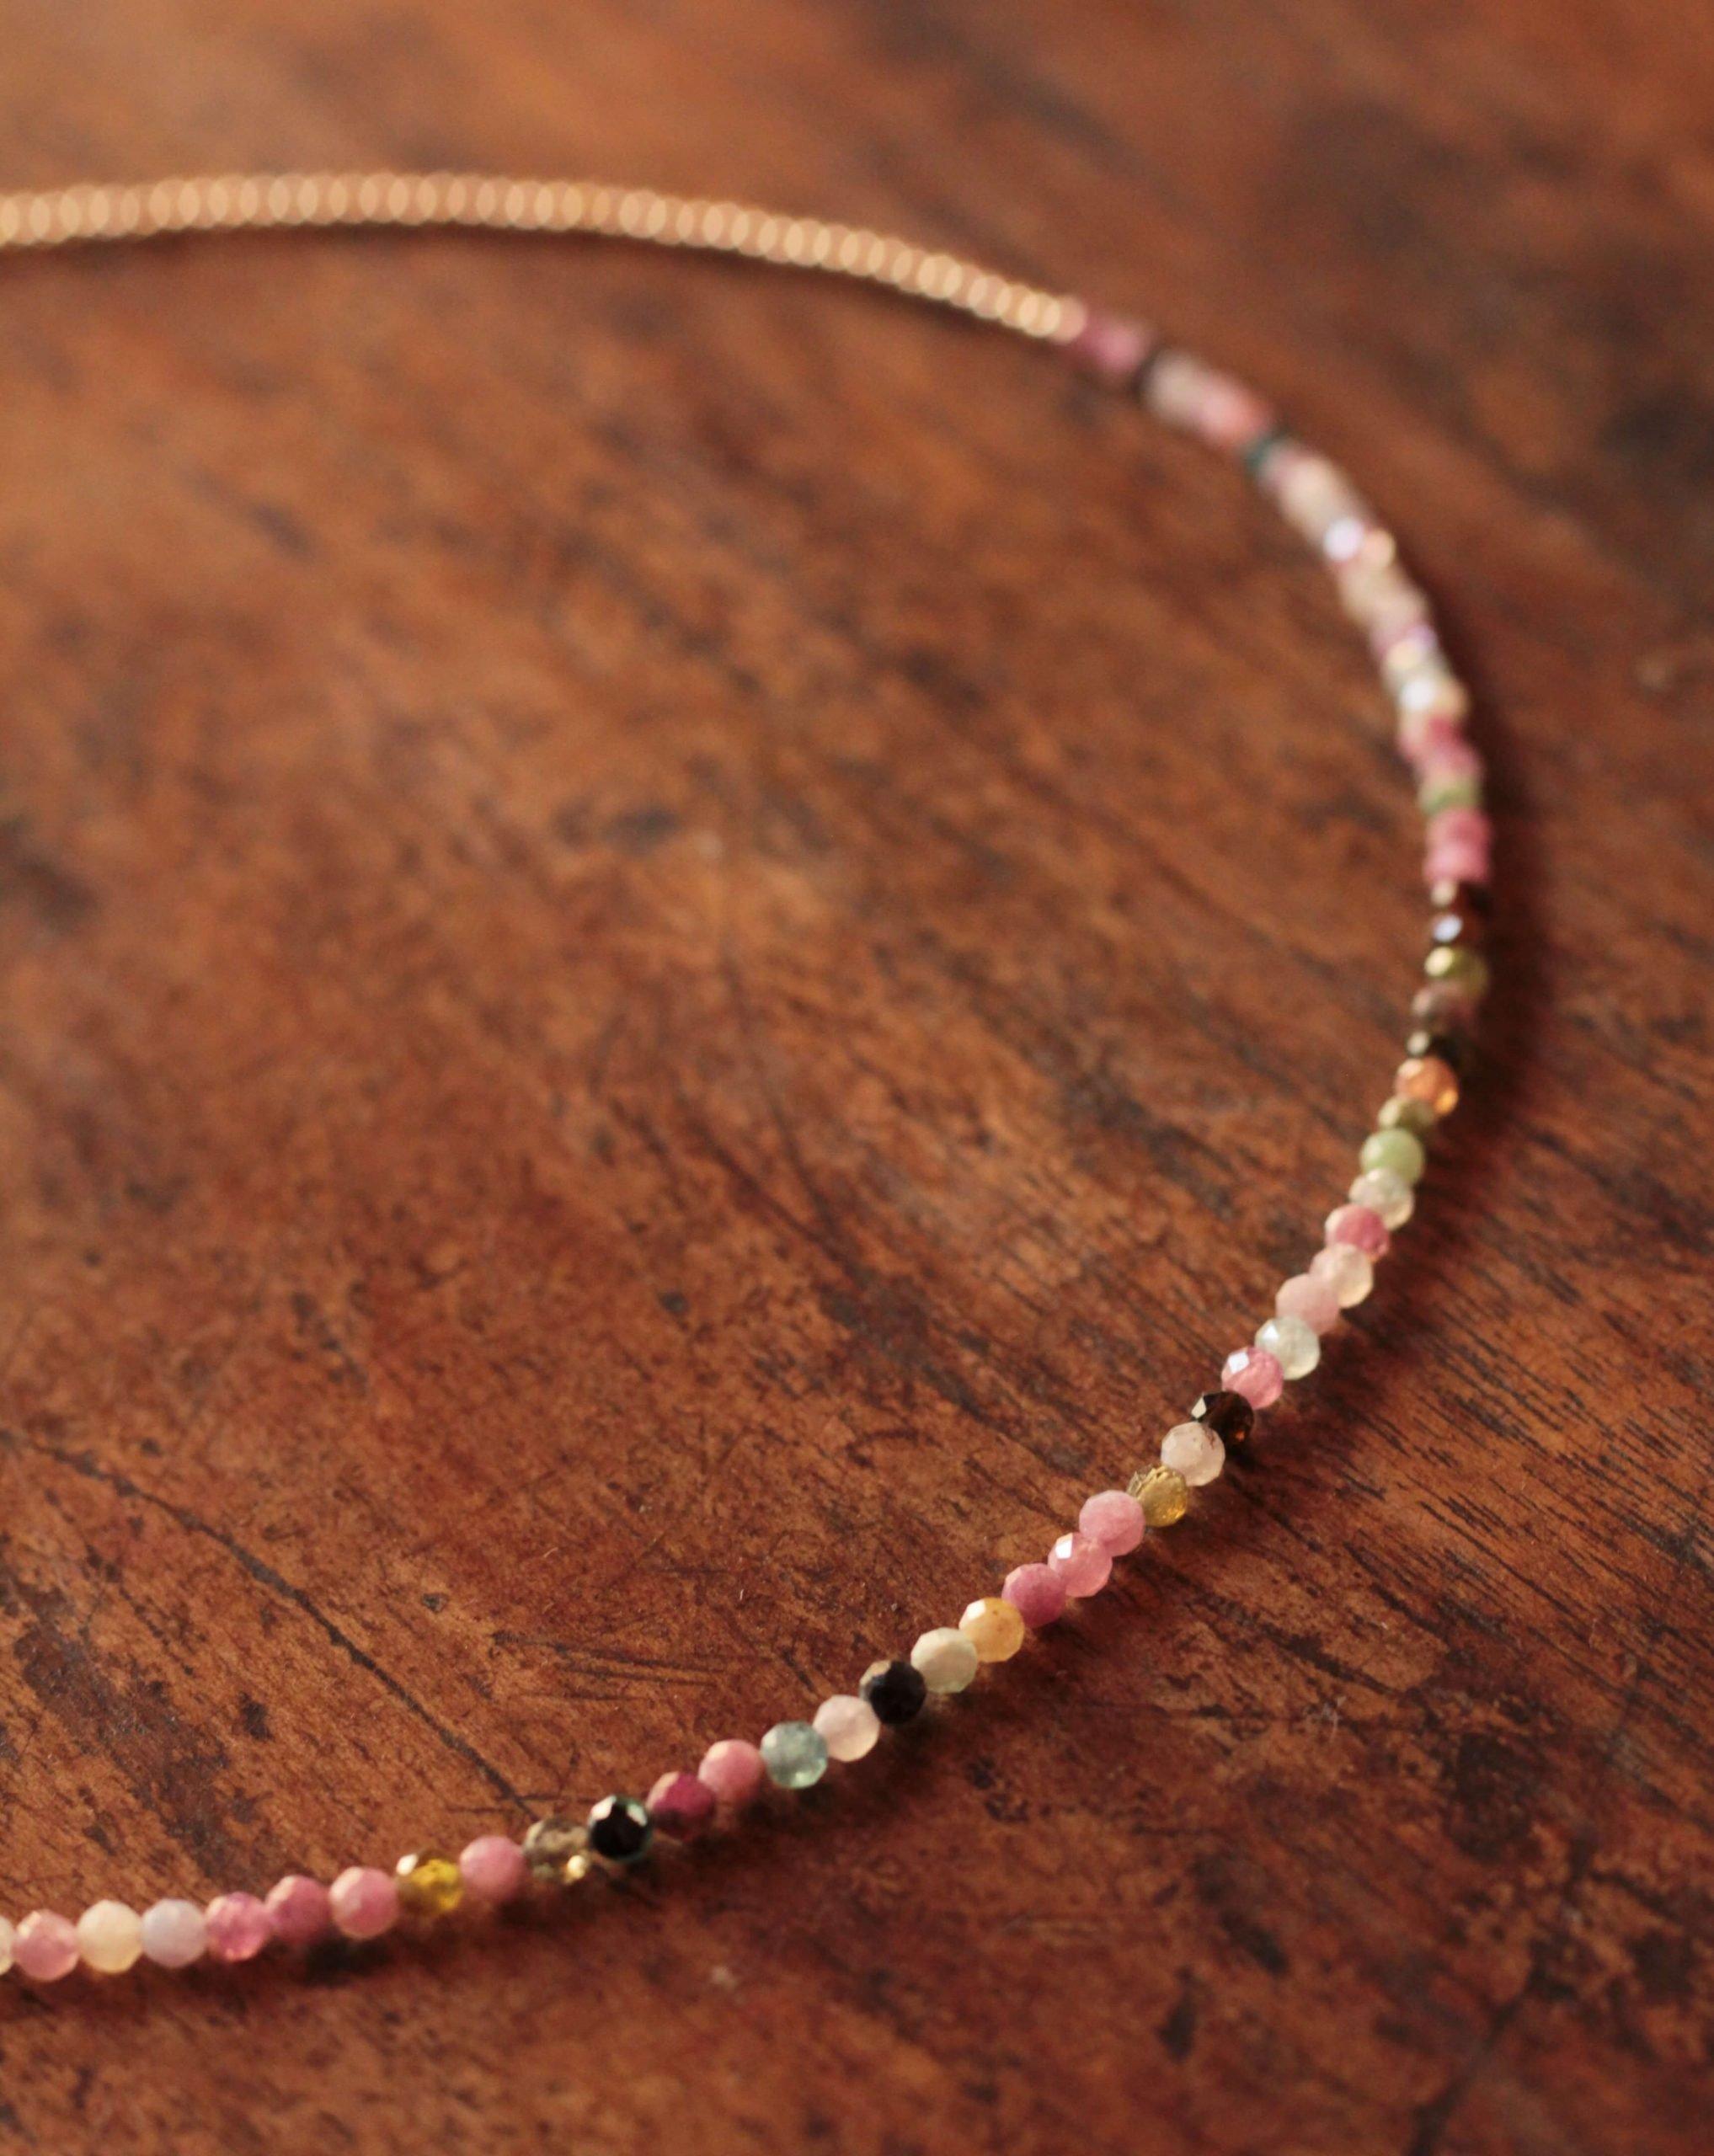 Kurze Halskette vergoldet 18k Bunte Achat Perlen Boho Schmuck